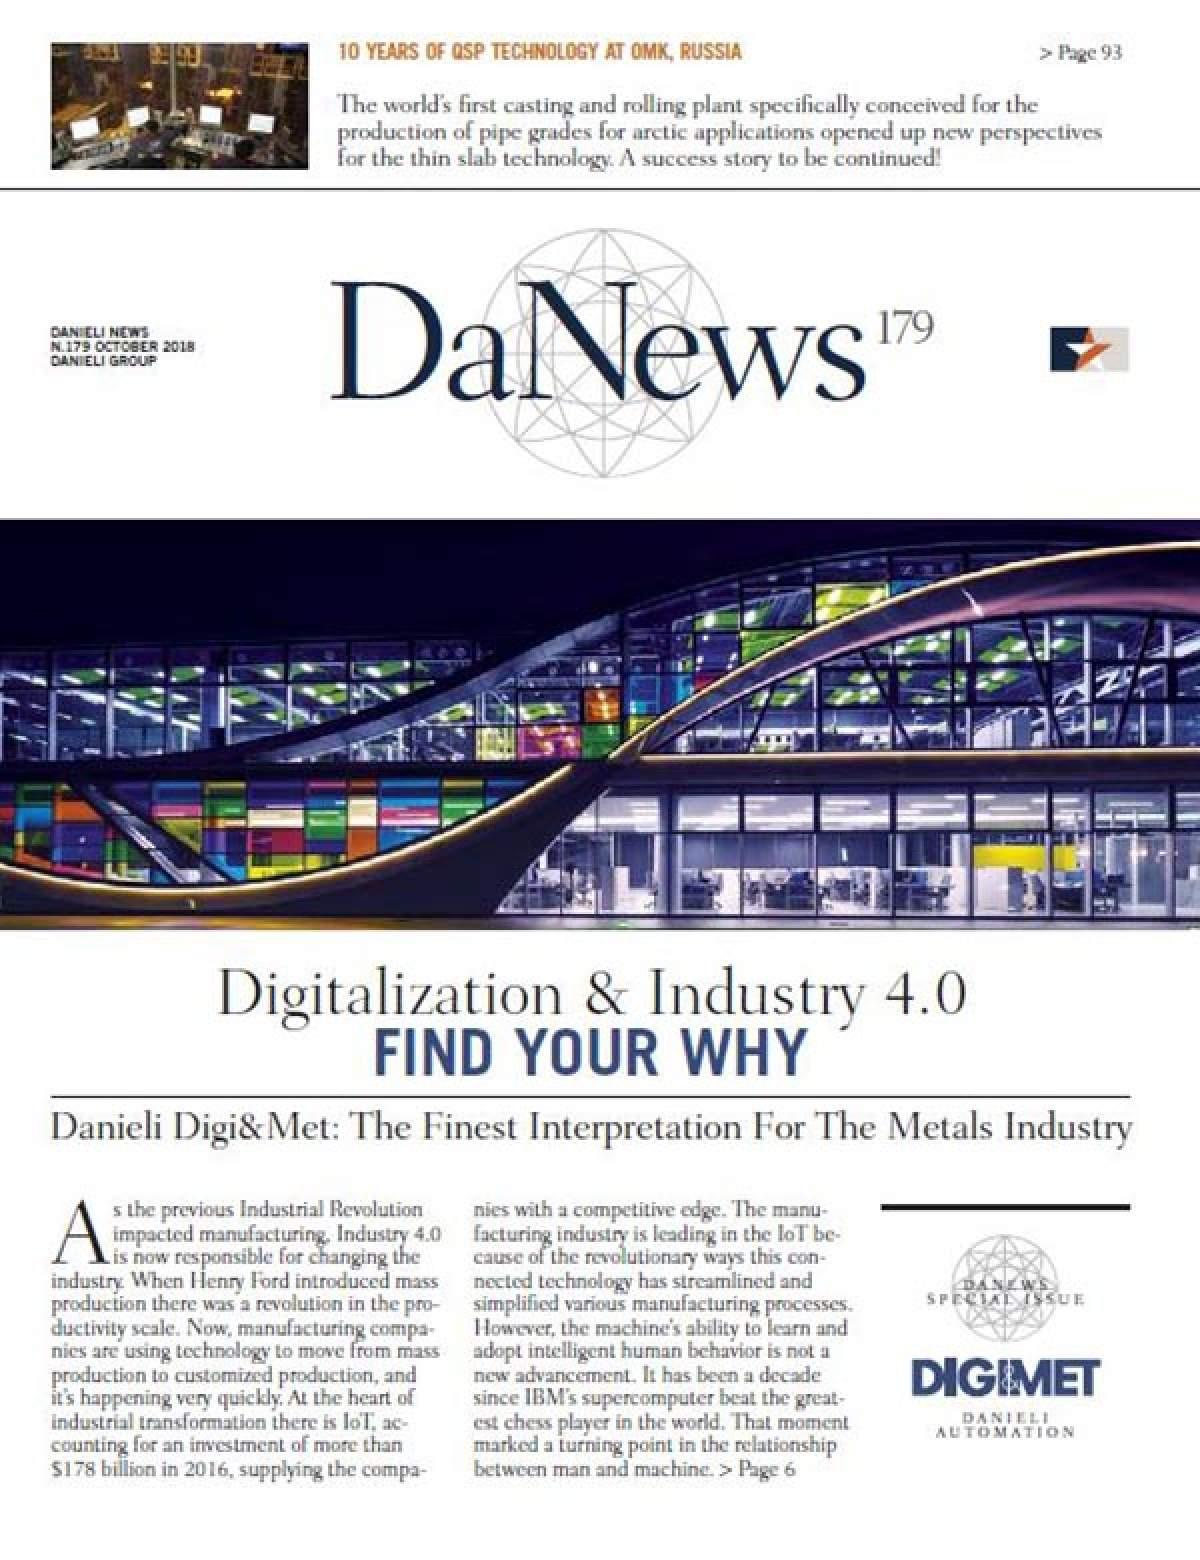 DaNews DaNews 179